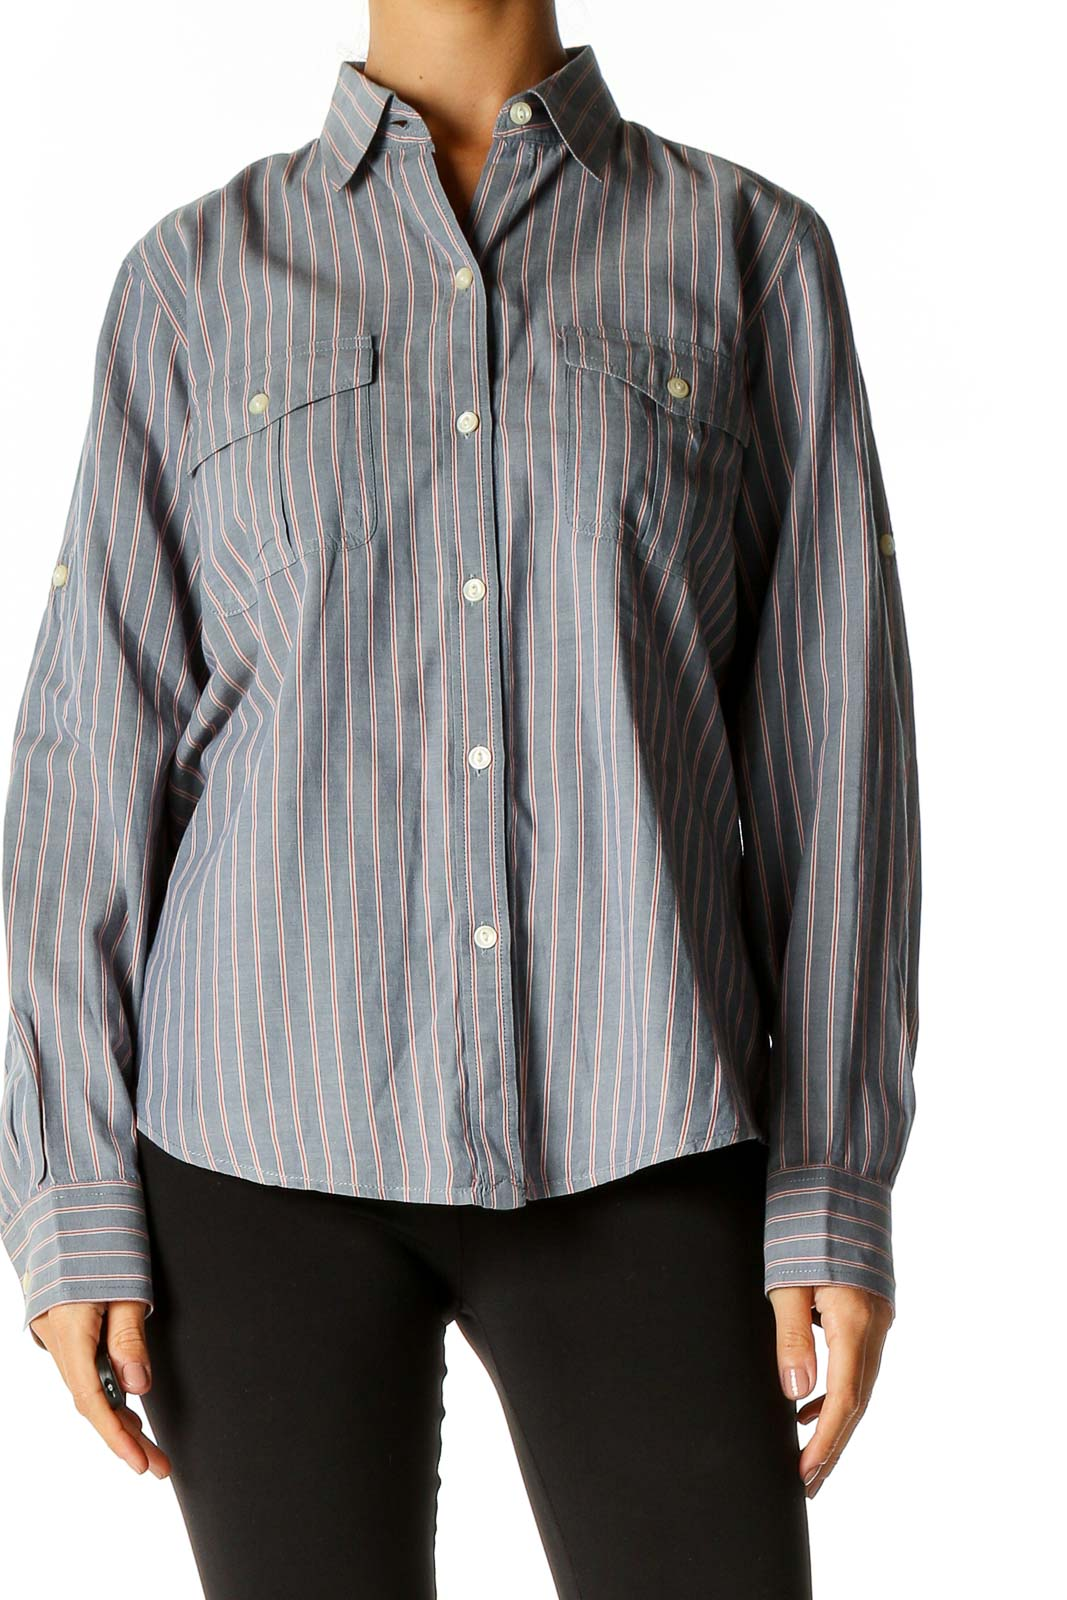 Gray Striped Semiformal Shirt Front